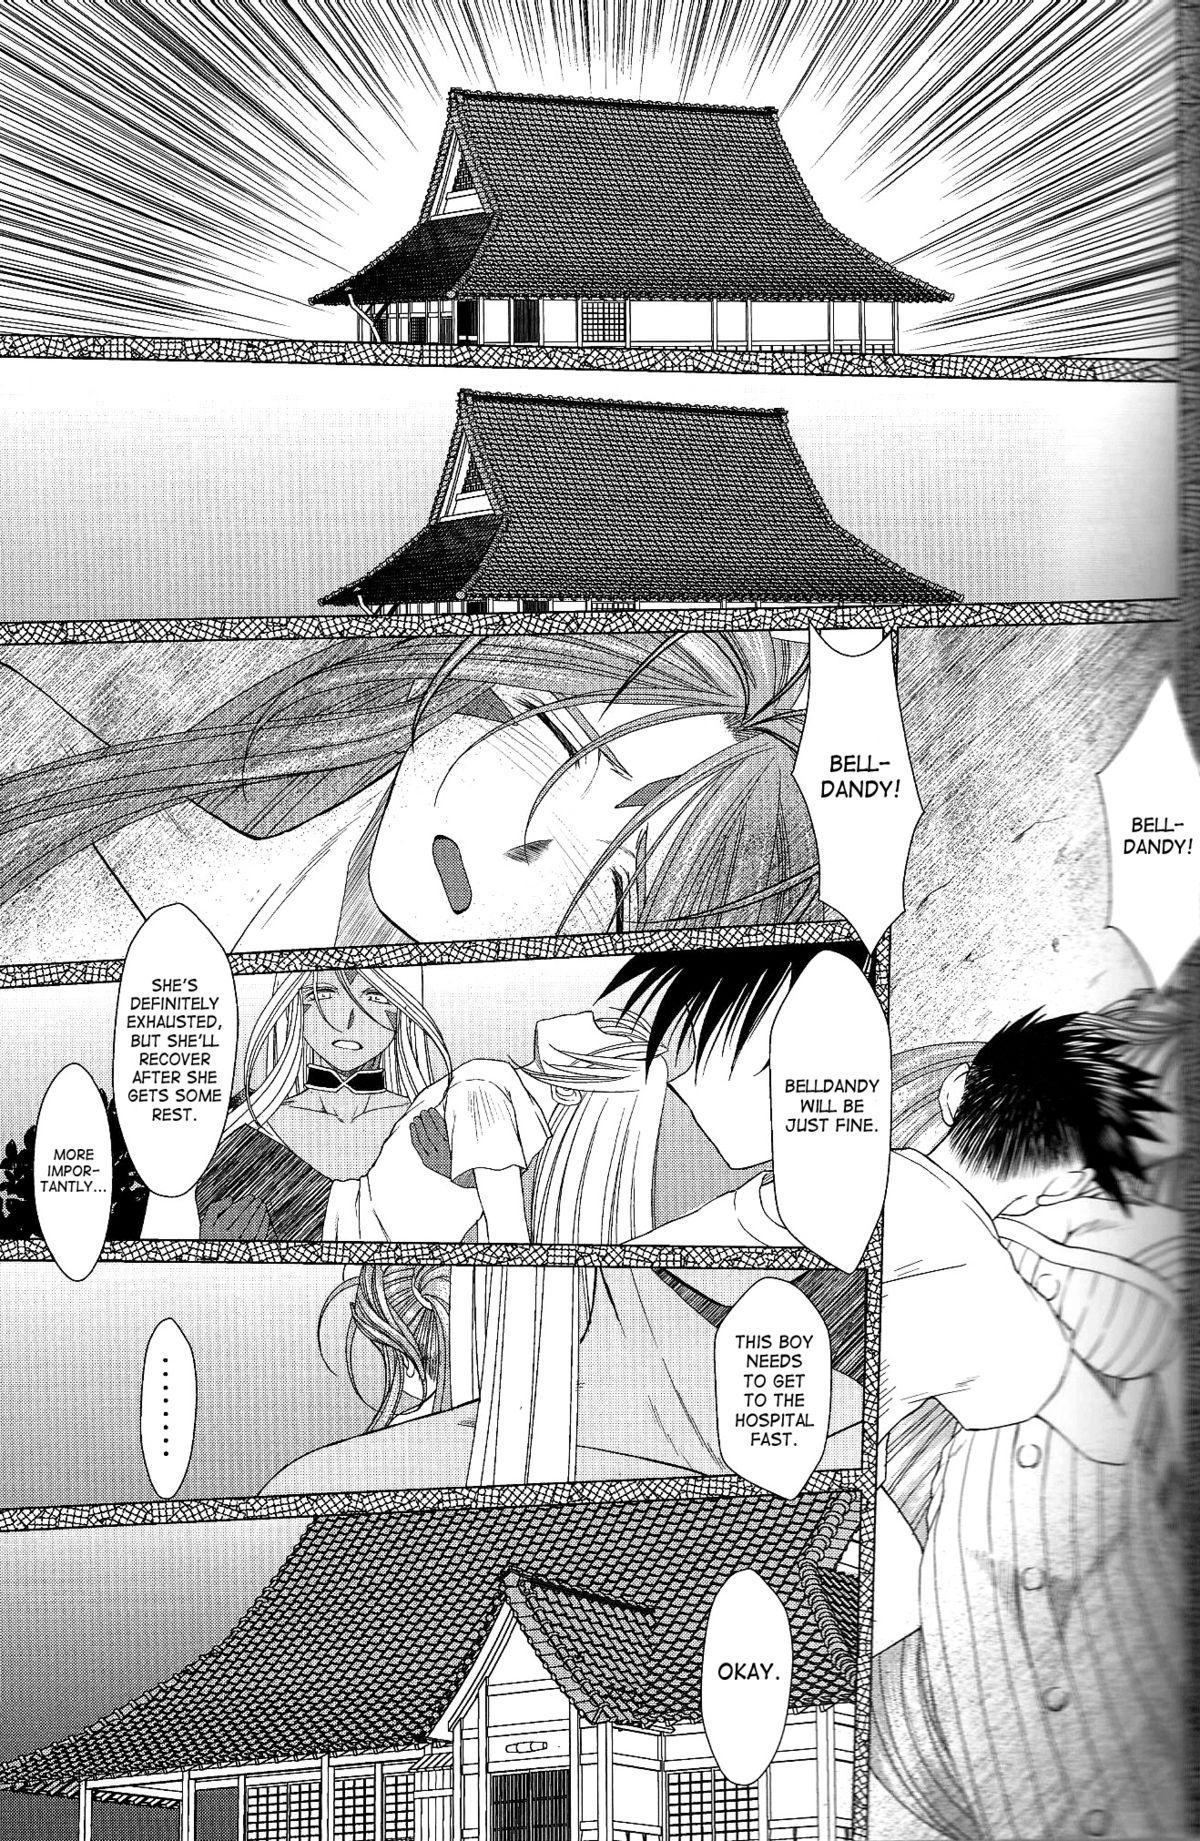 (C63) [CIRCLE OUTERWORLD (Chiba Shuusaku)] Midgard  (Ah! My Goddess) complete [eng] 622